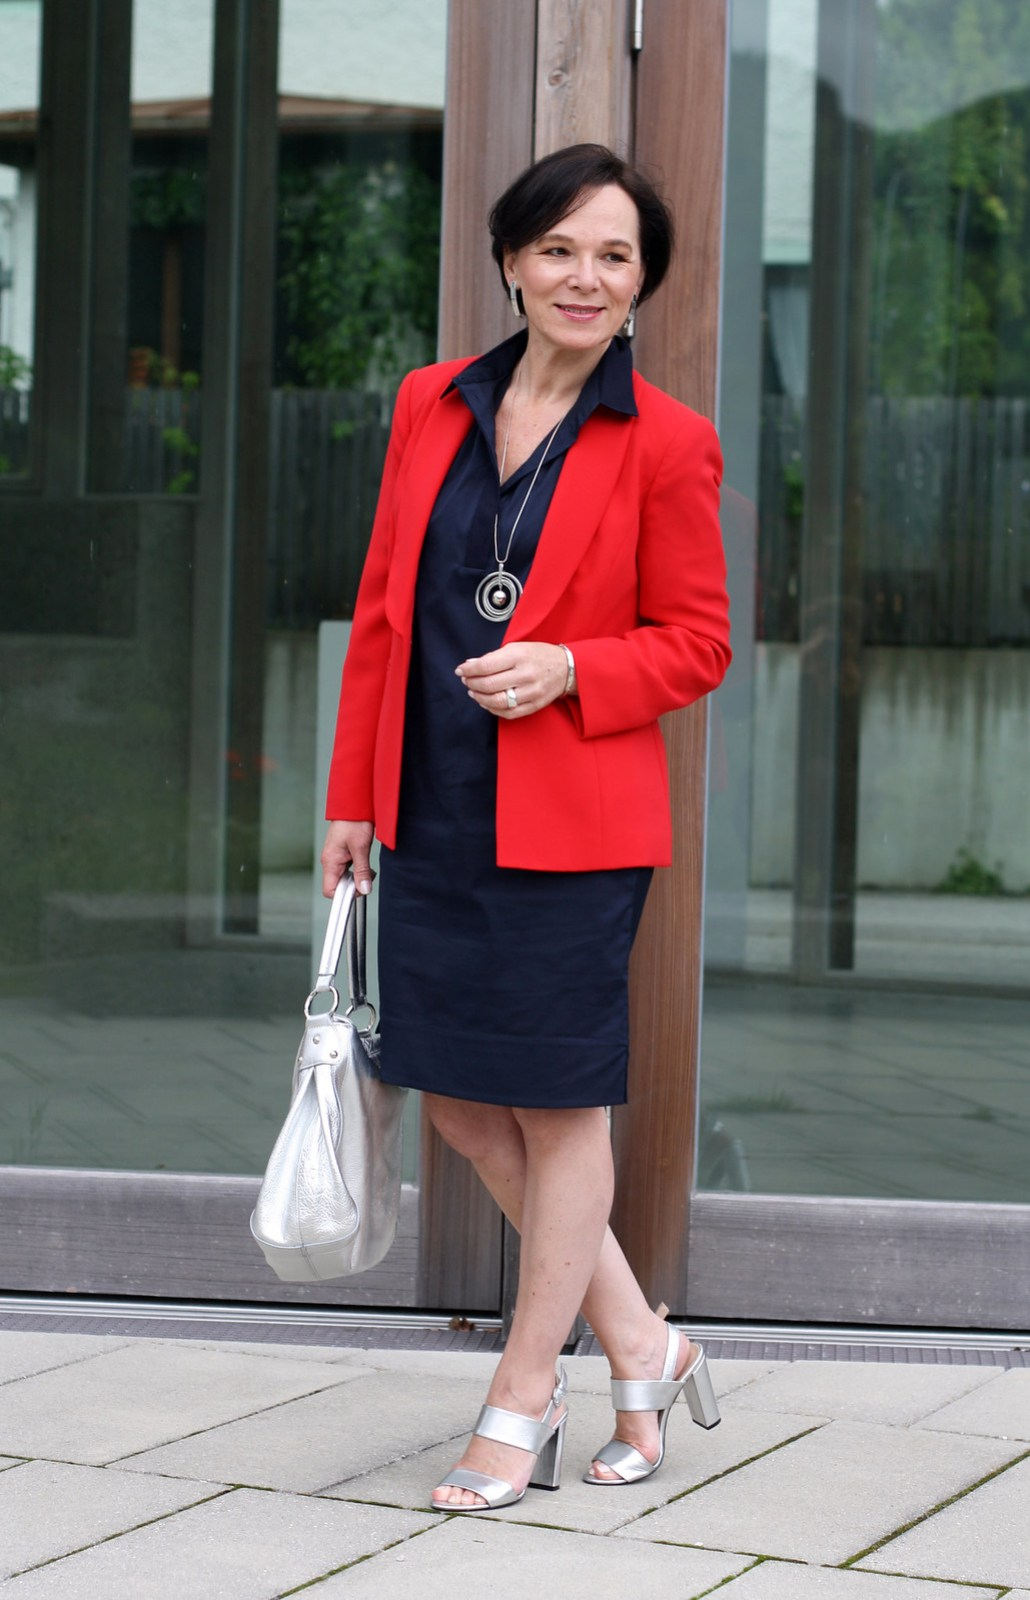 LadyofStyle Blue Shirtdress COS Red Blazer Madeleine Office Look